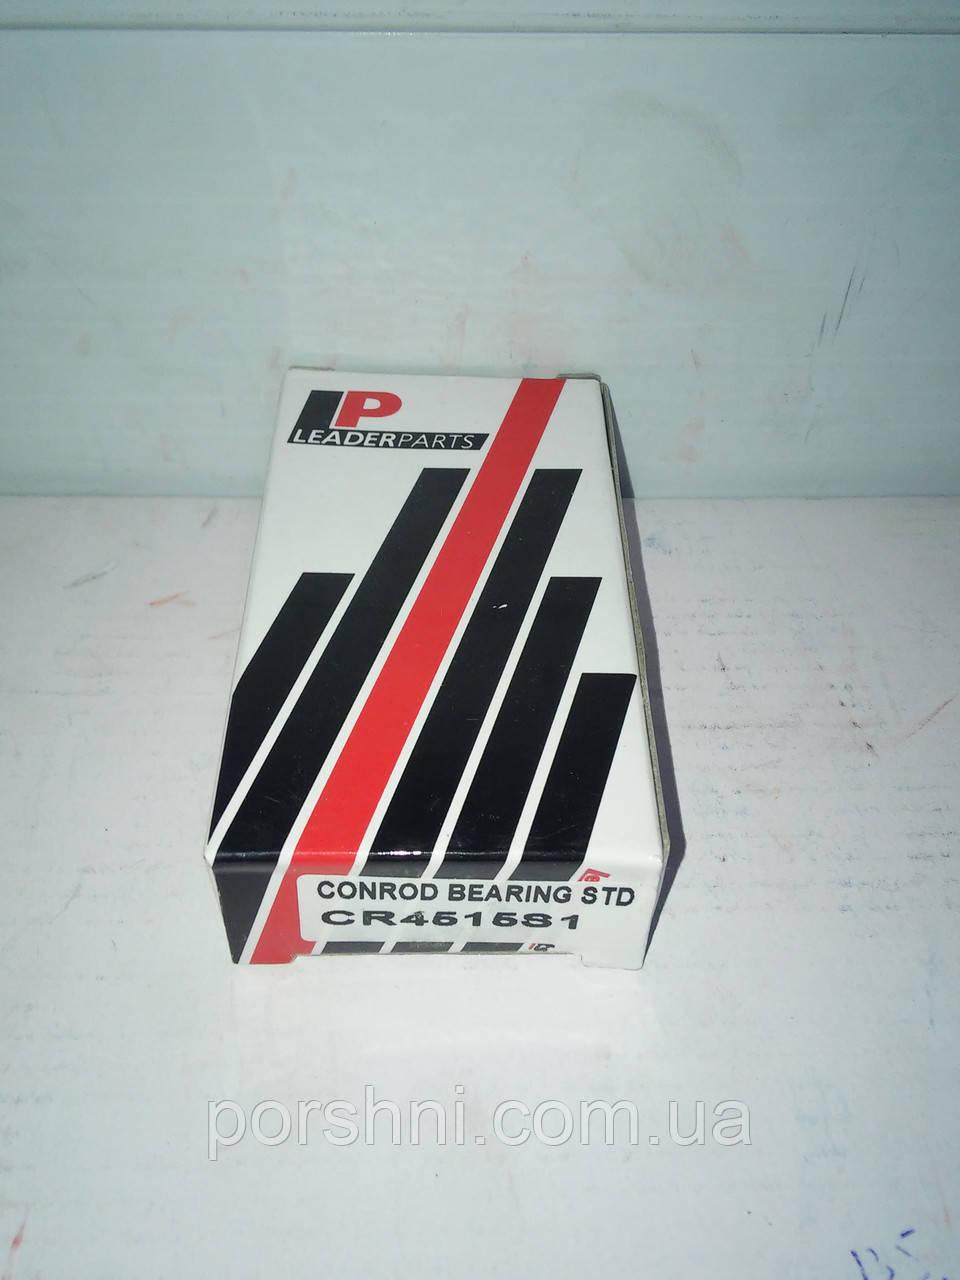 Вкладыши шатунные Ford  Fiesta Focus  1.25 - 1.6 ZETEK  STD  Leaderp CR4151AM